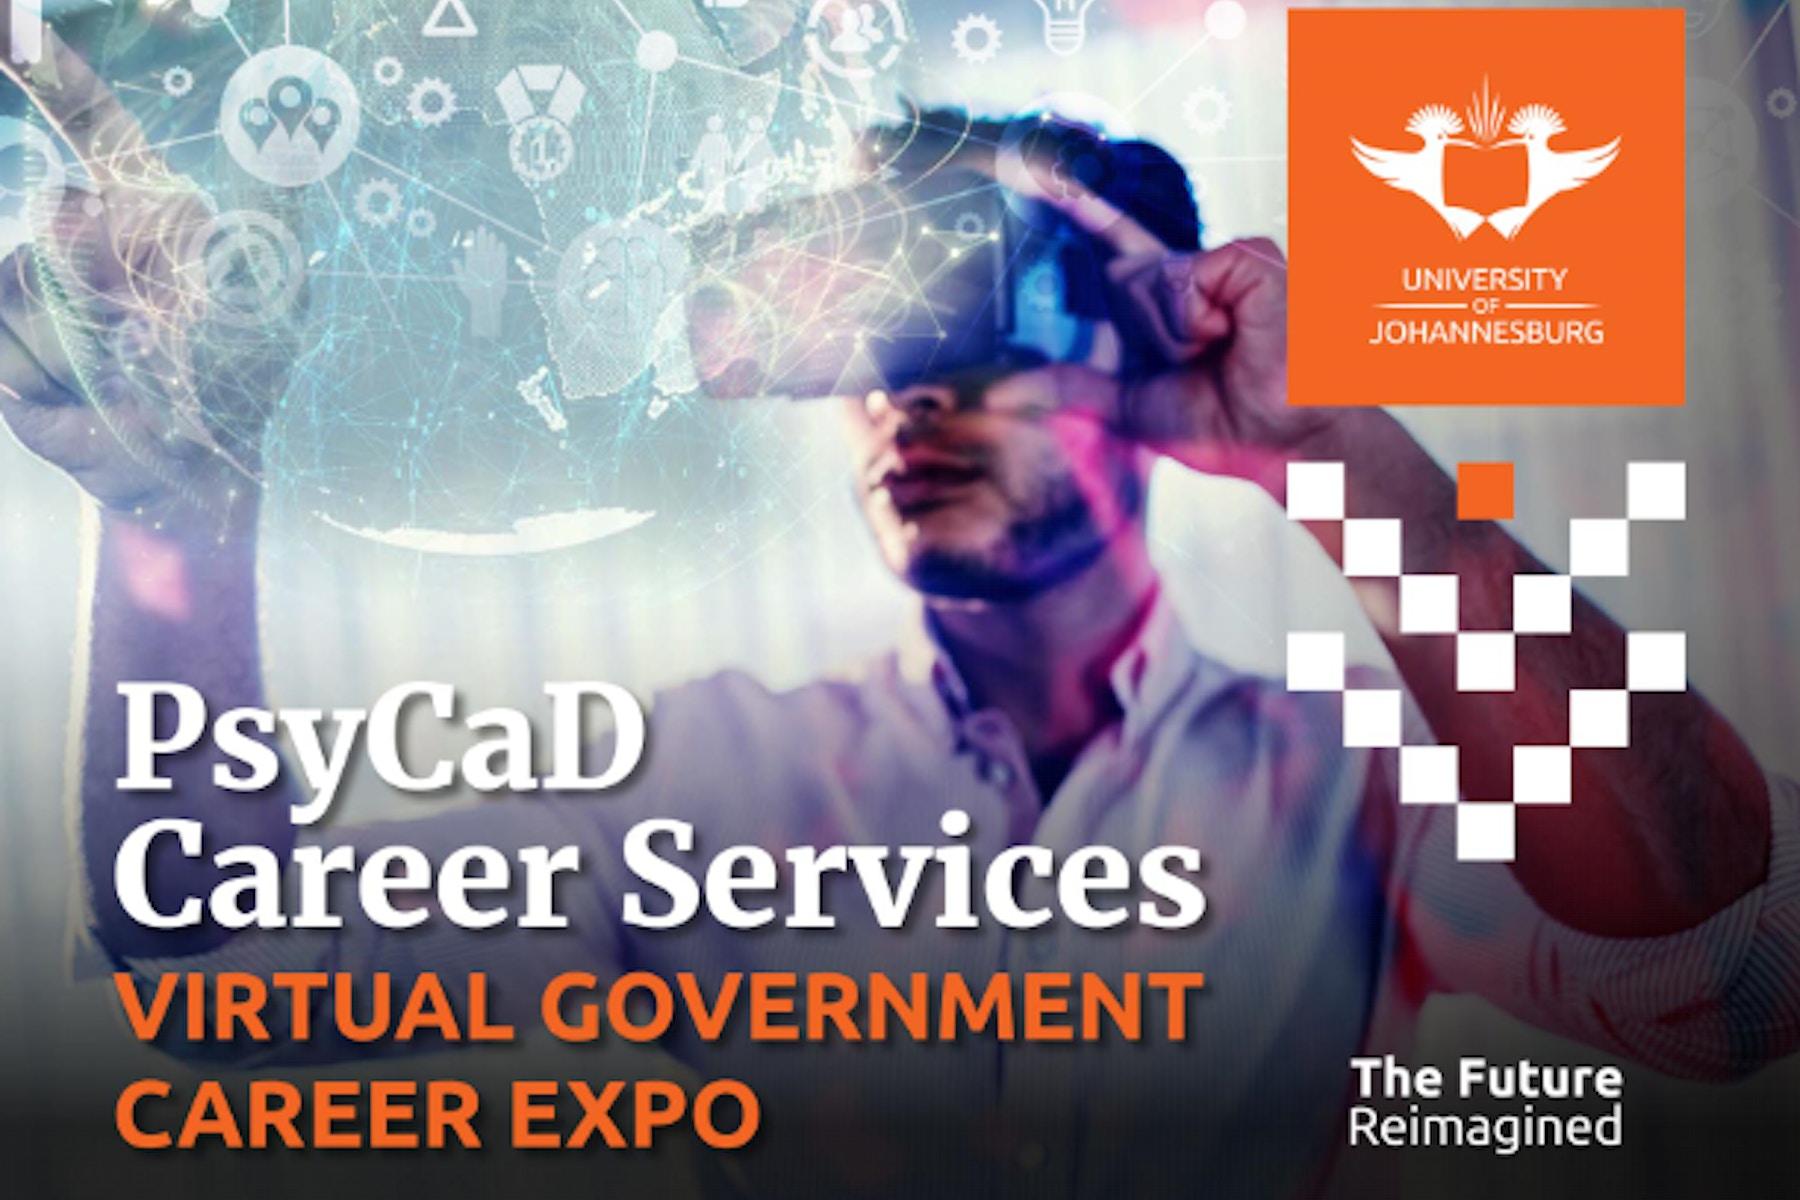 UJ Career Expo